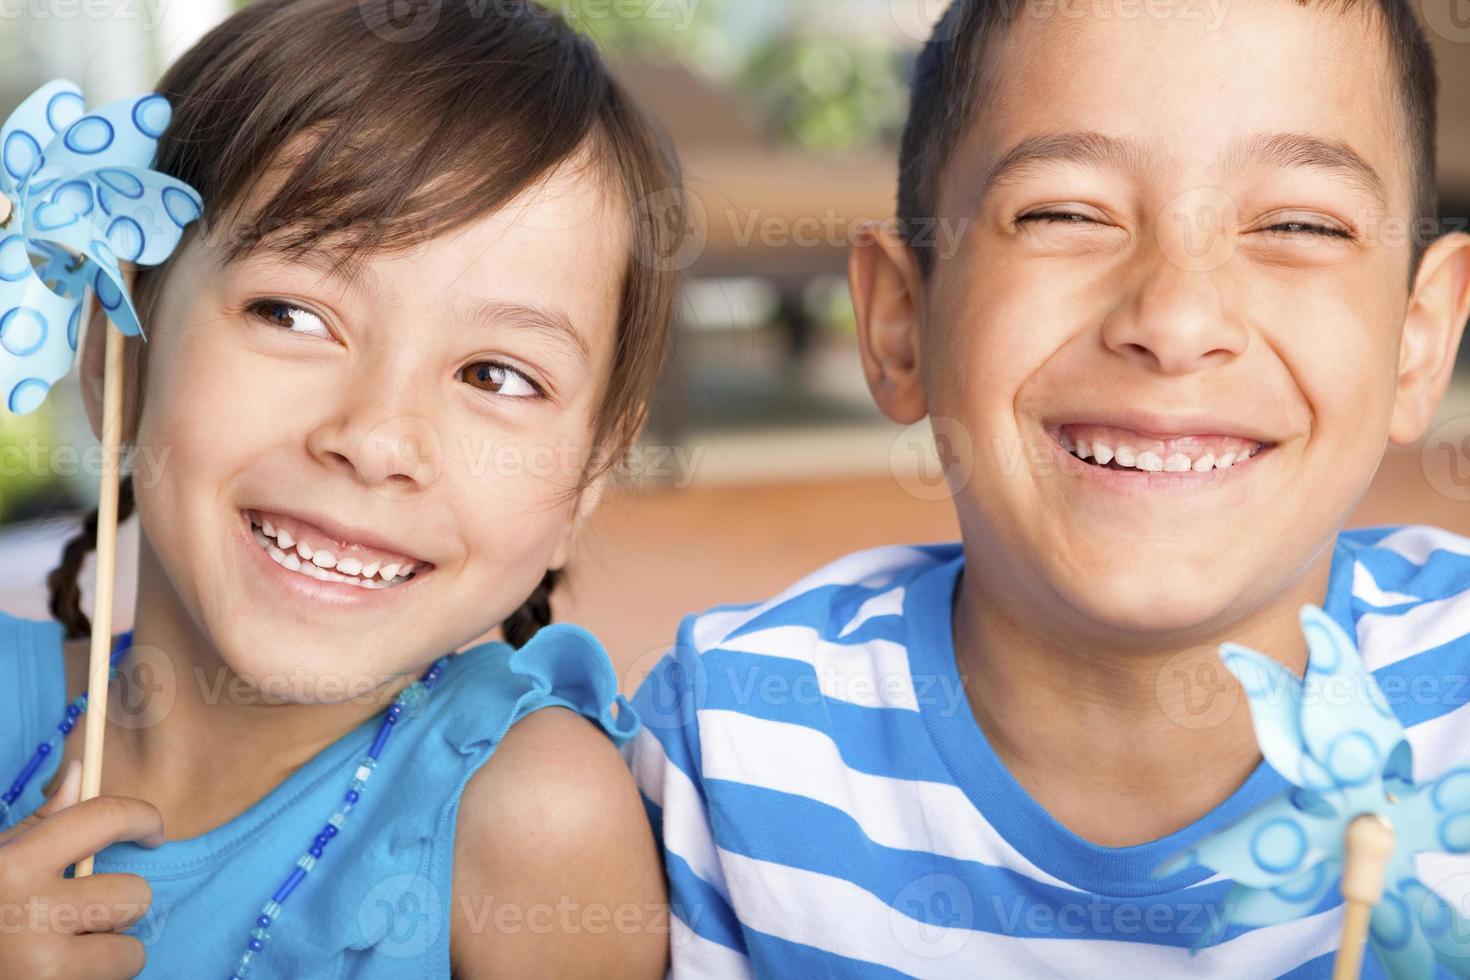 jonge jongen en meisje spelen met hun pinwheel foto